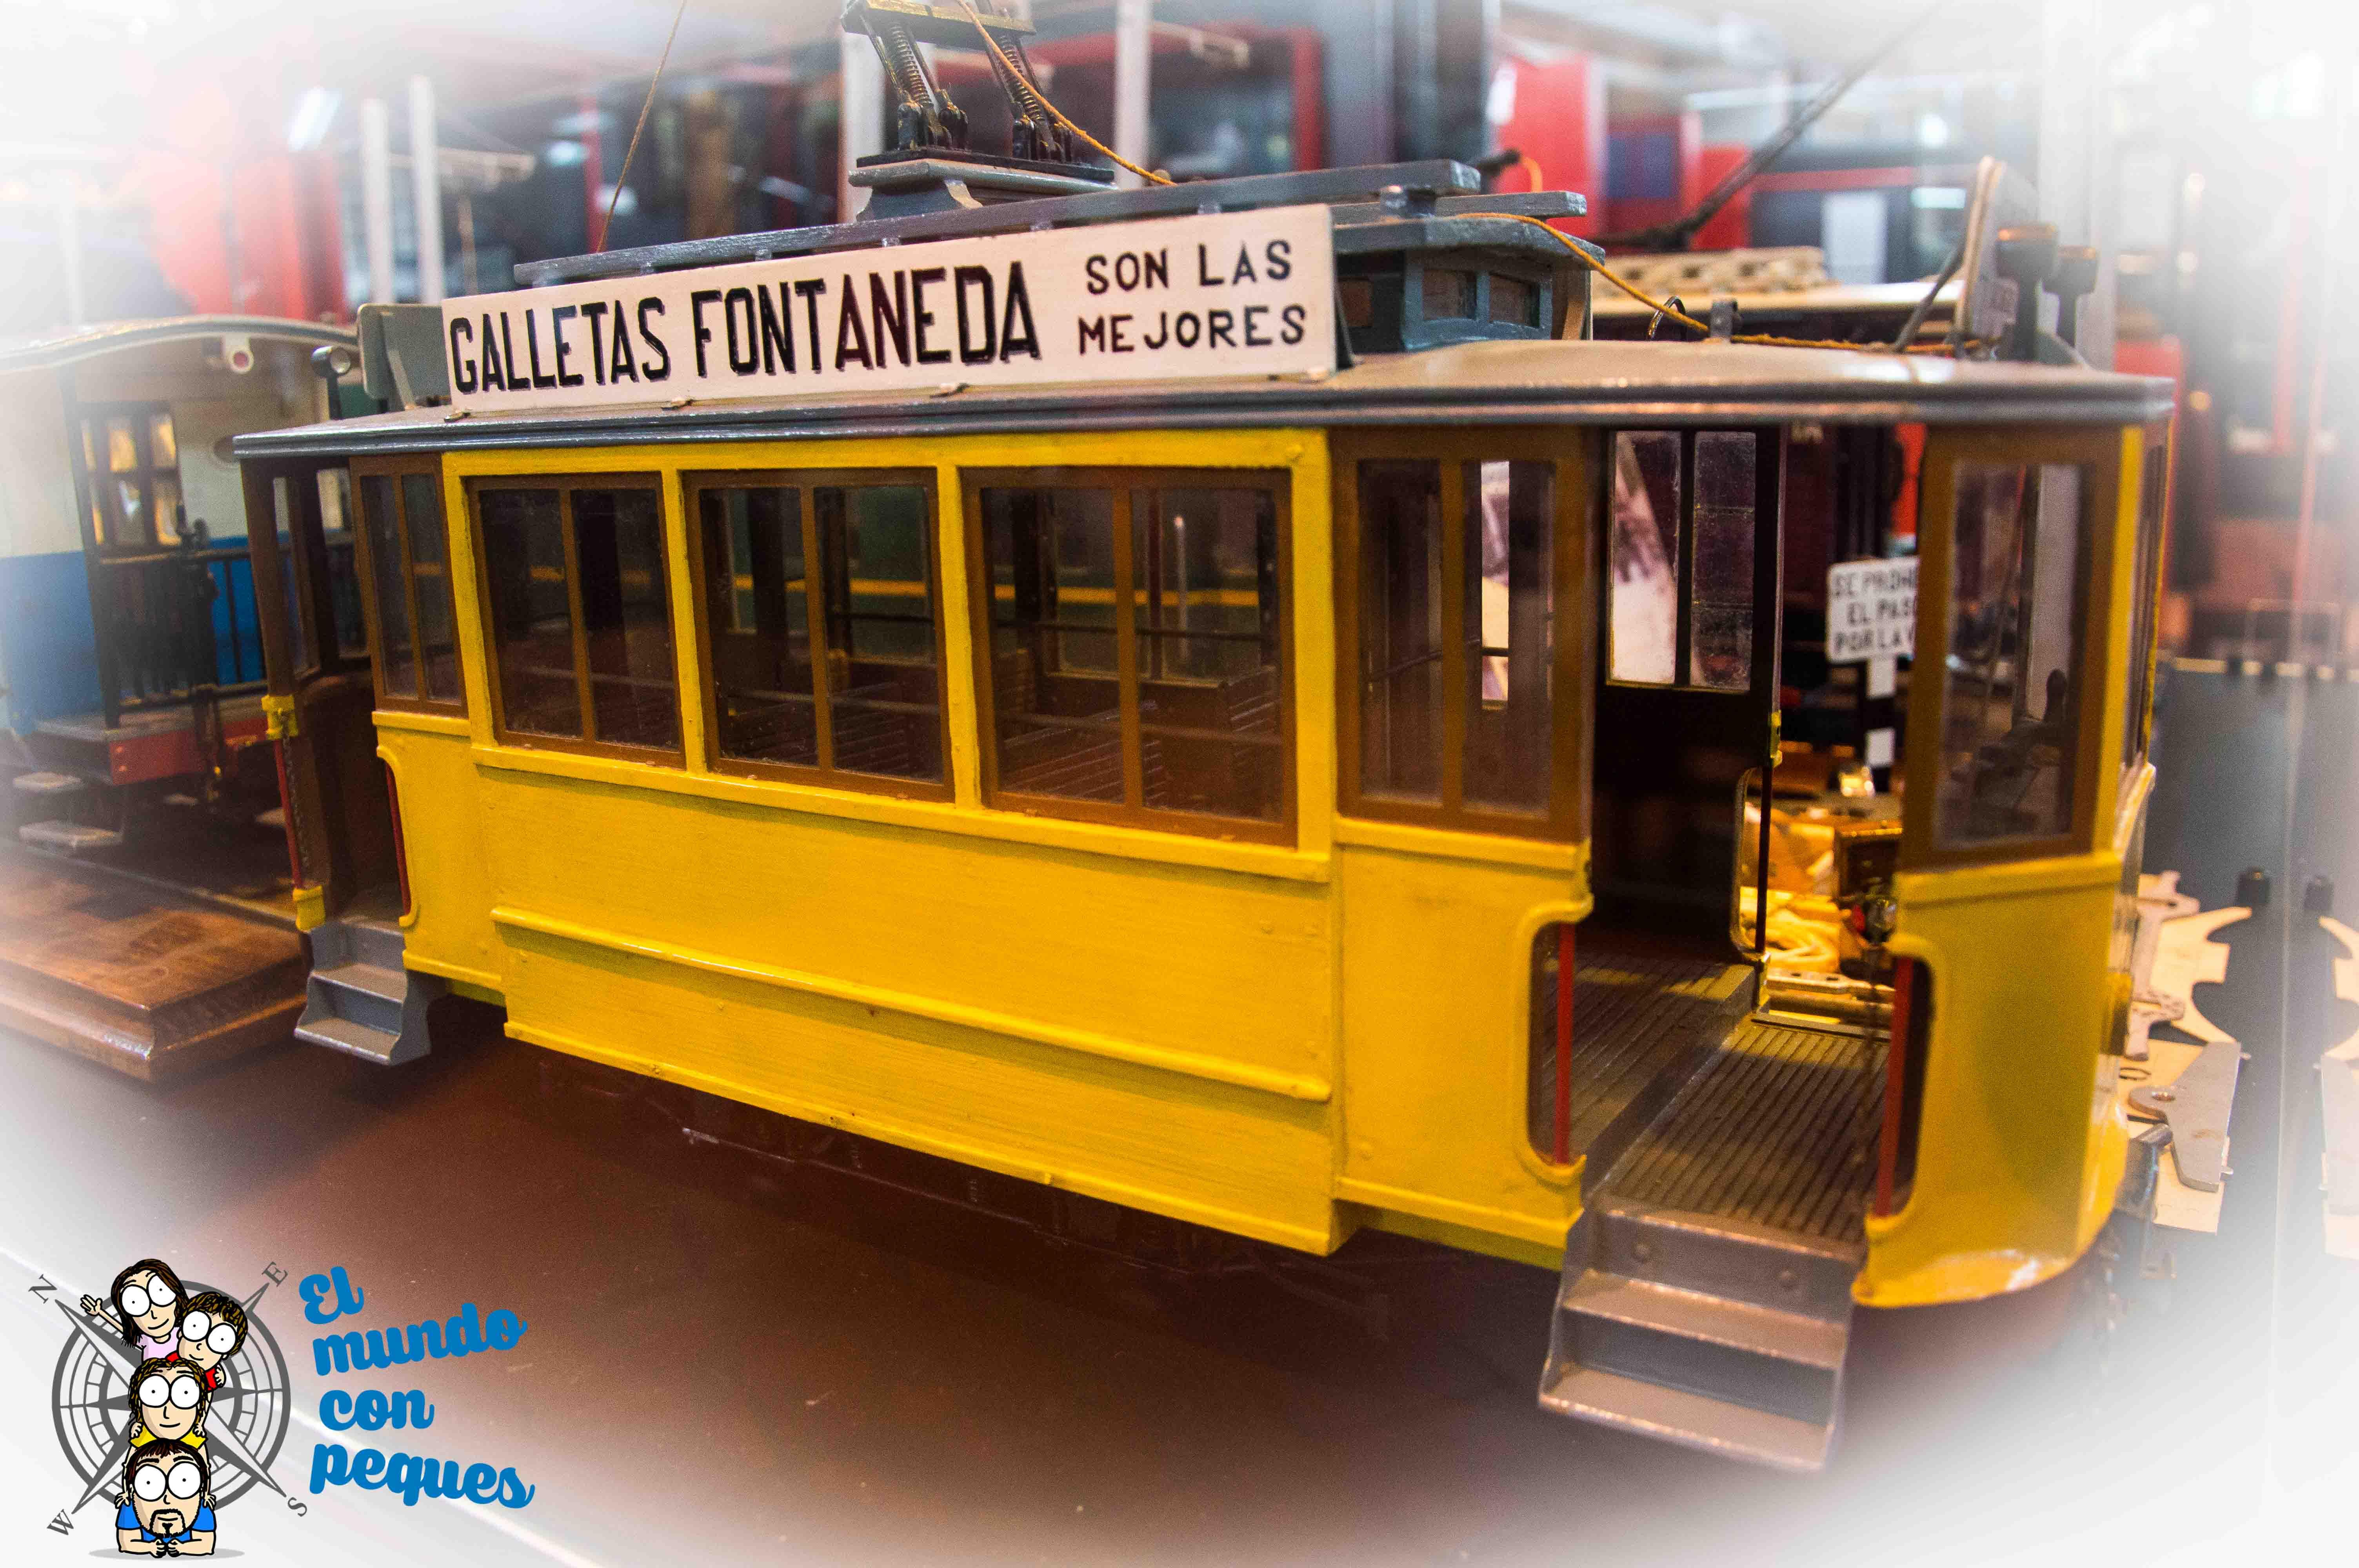 Maquetas en el museo vasco del ferrocarril